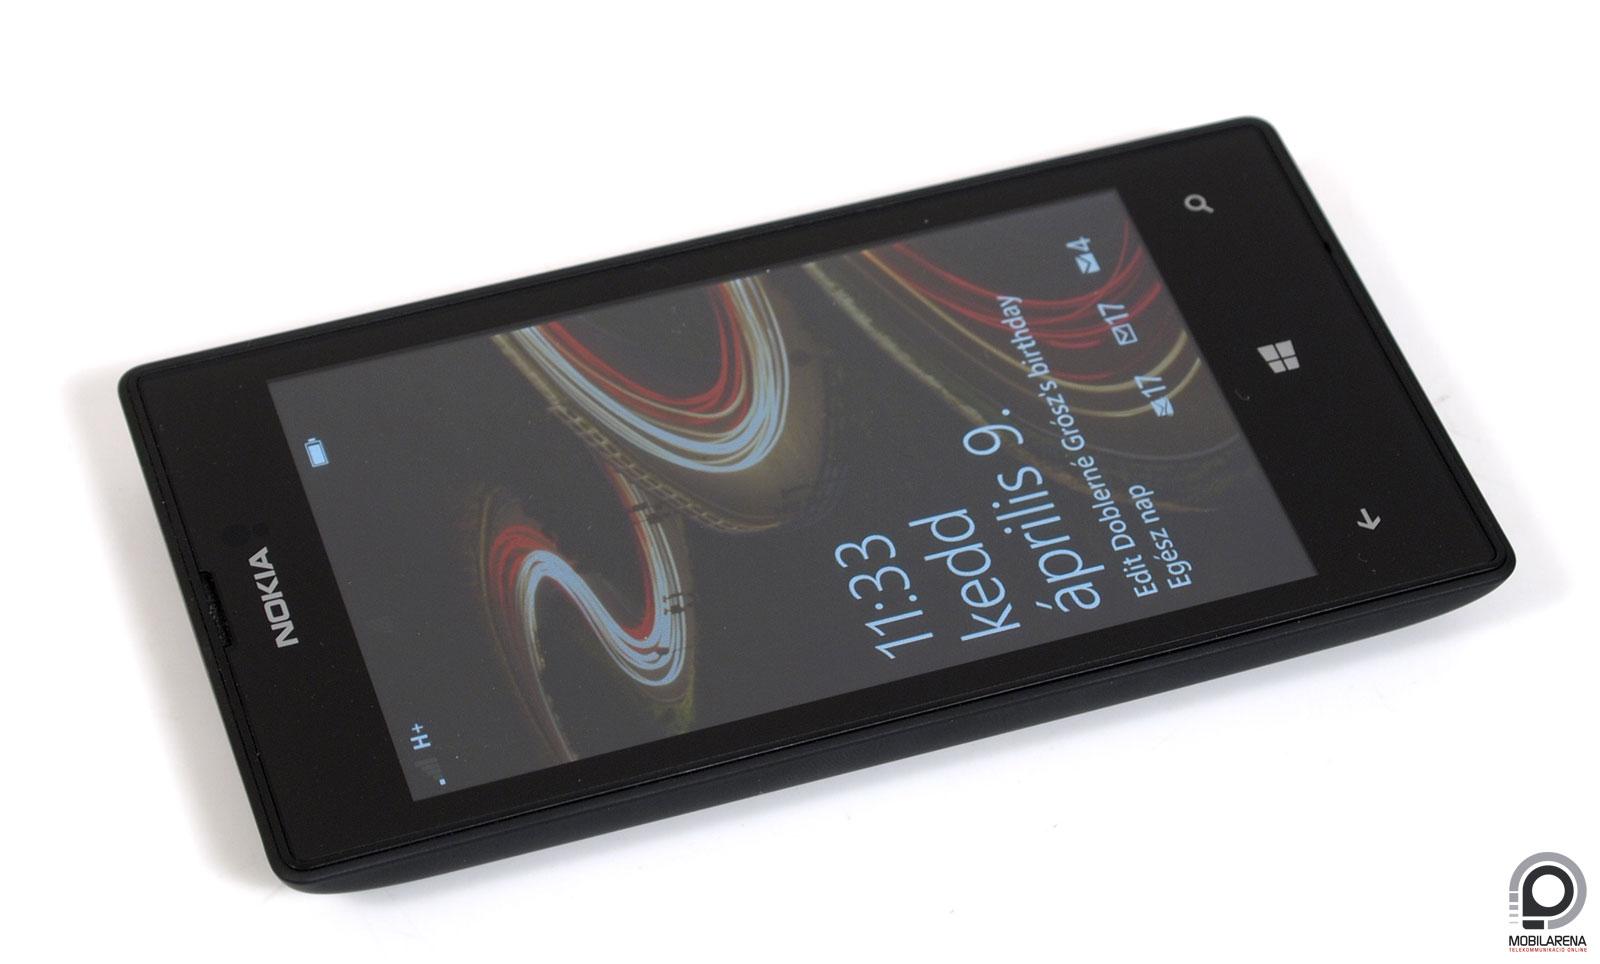 Cần tiền bán Nokia Lumia 520 giá rẻ